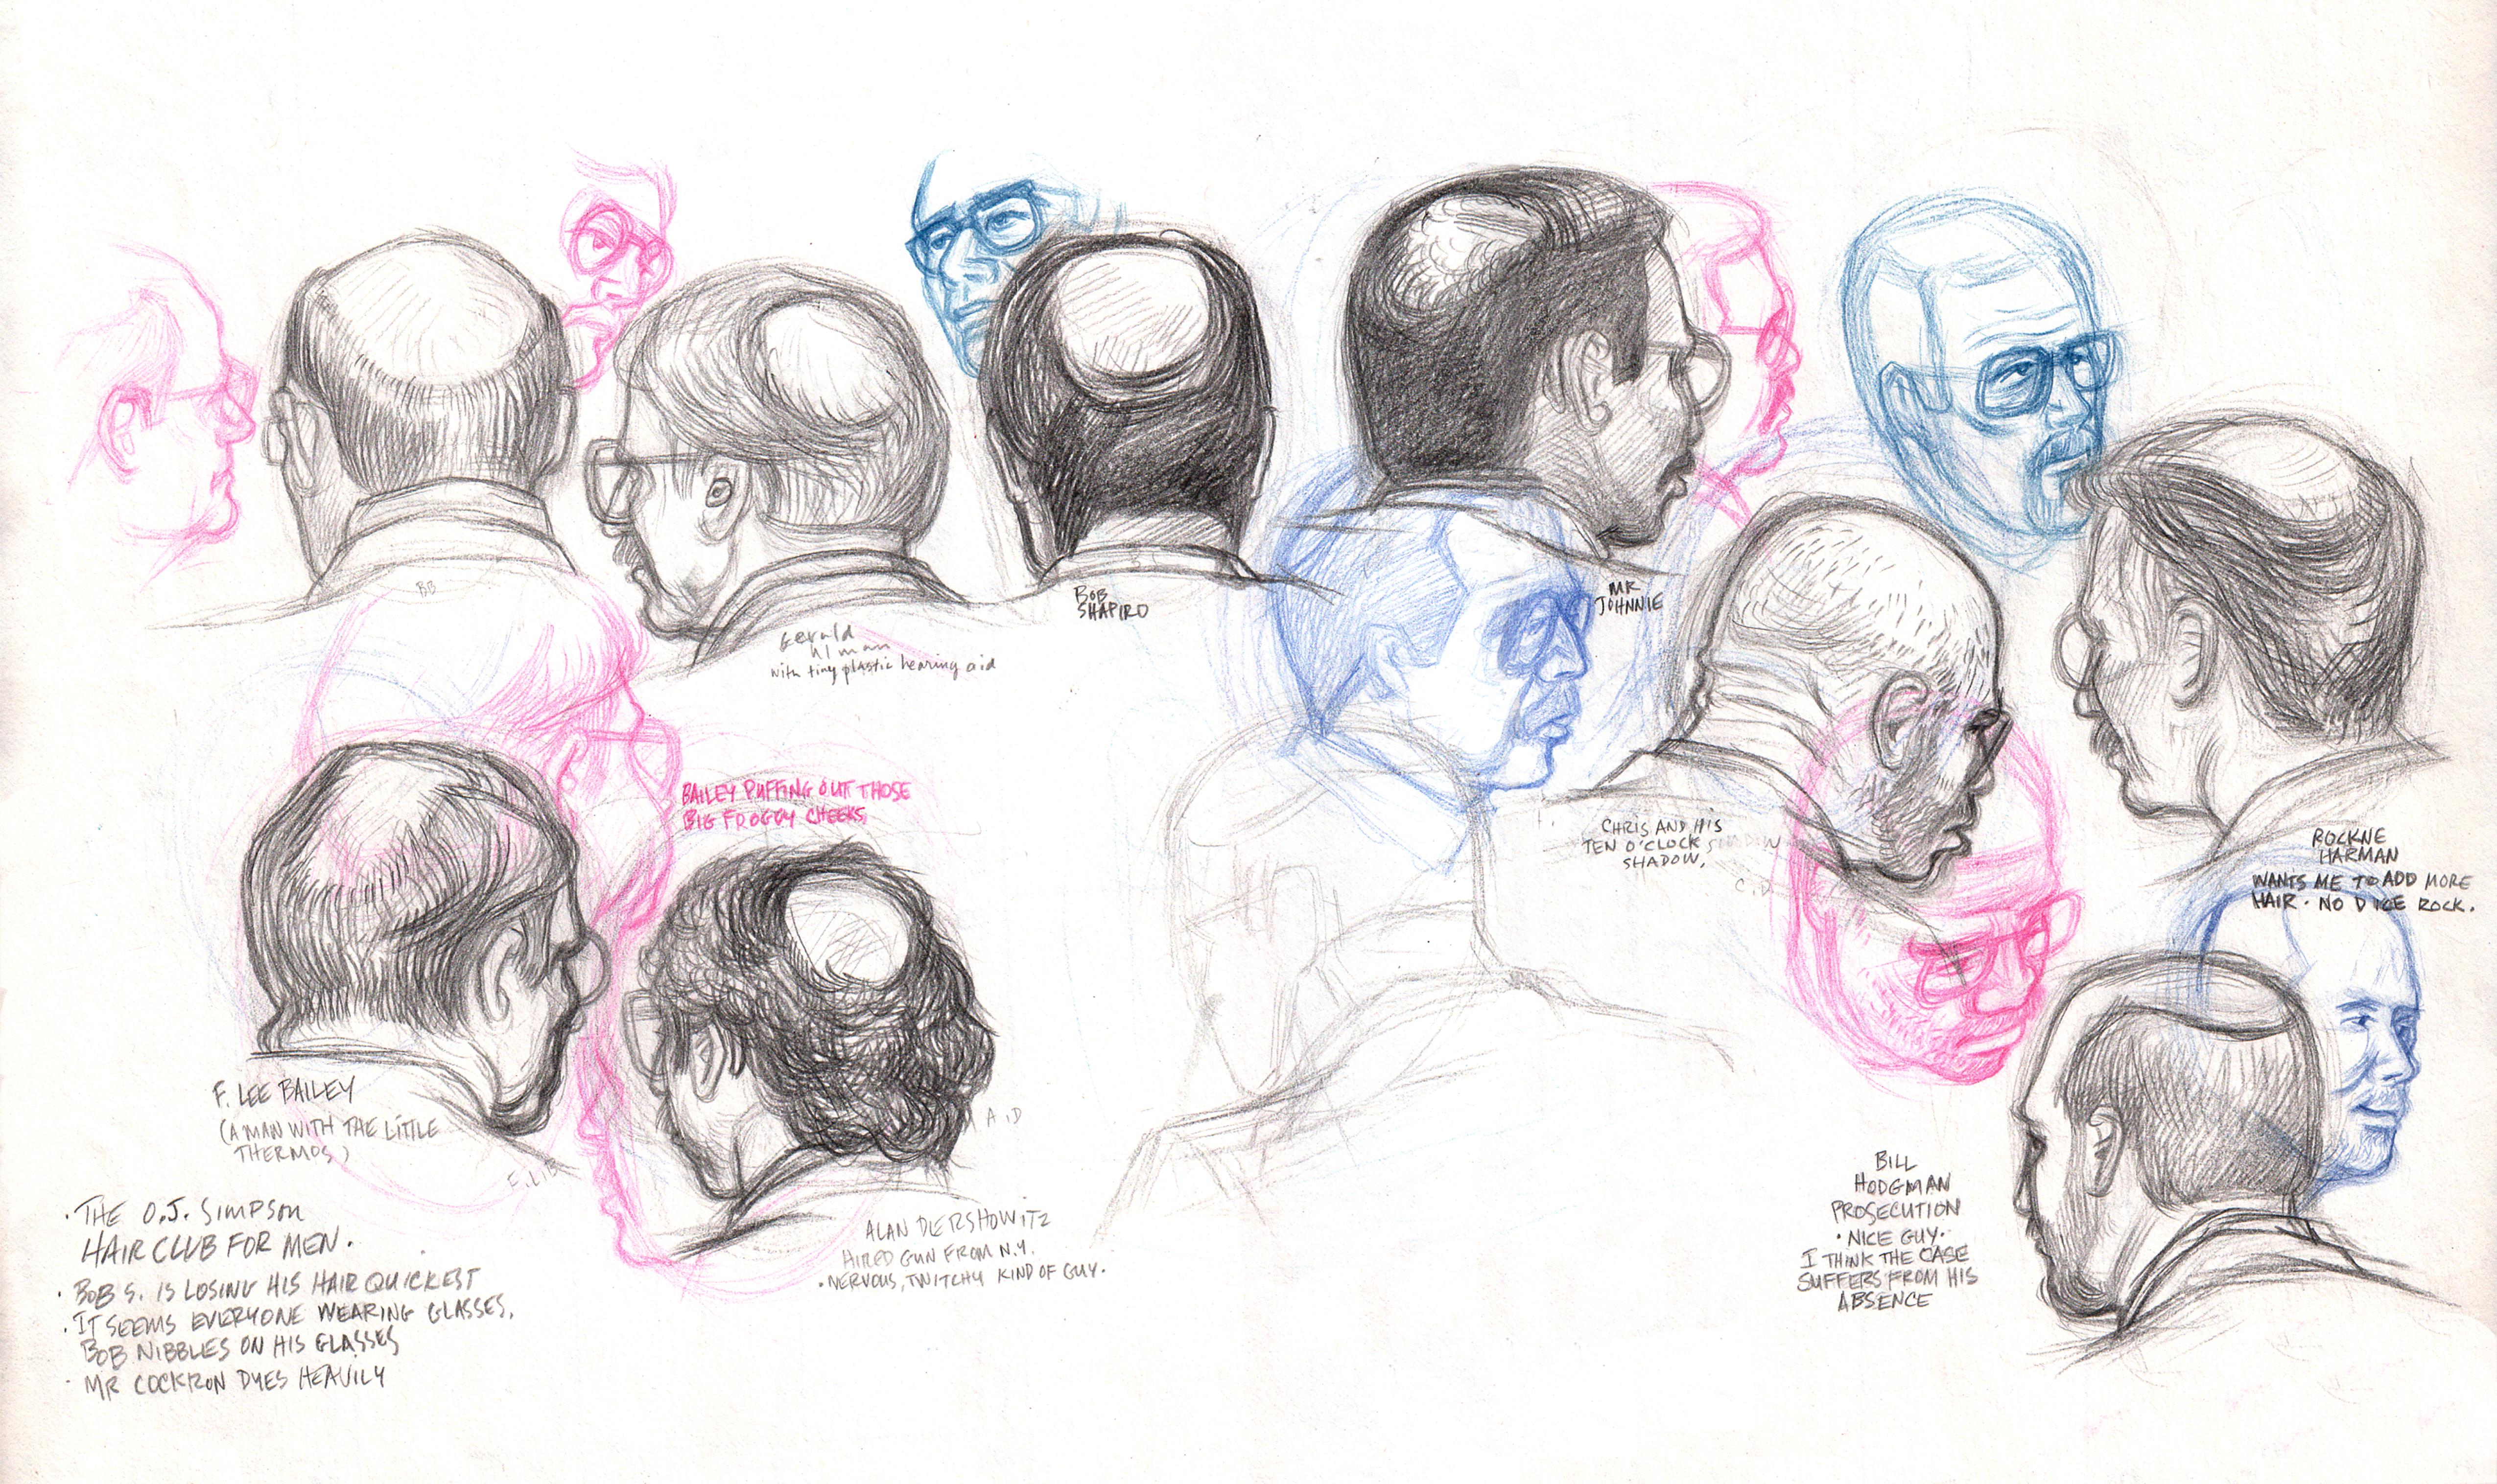 OJ Hair Club 4 Men- everyone is bald